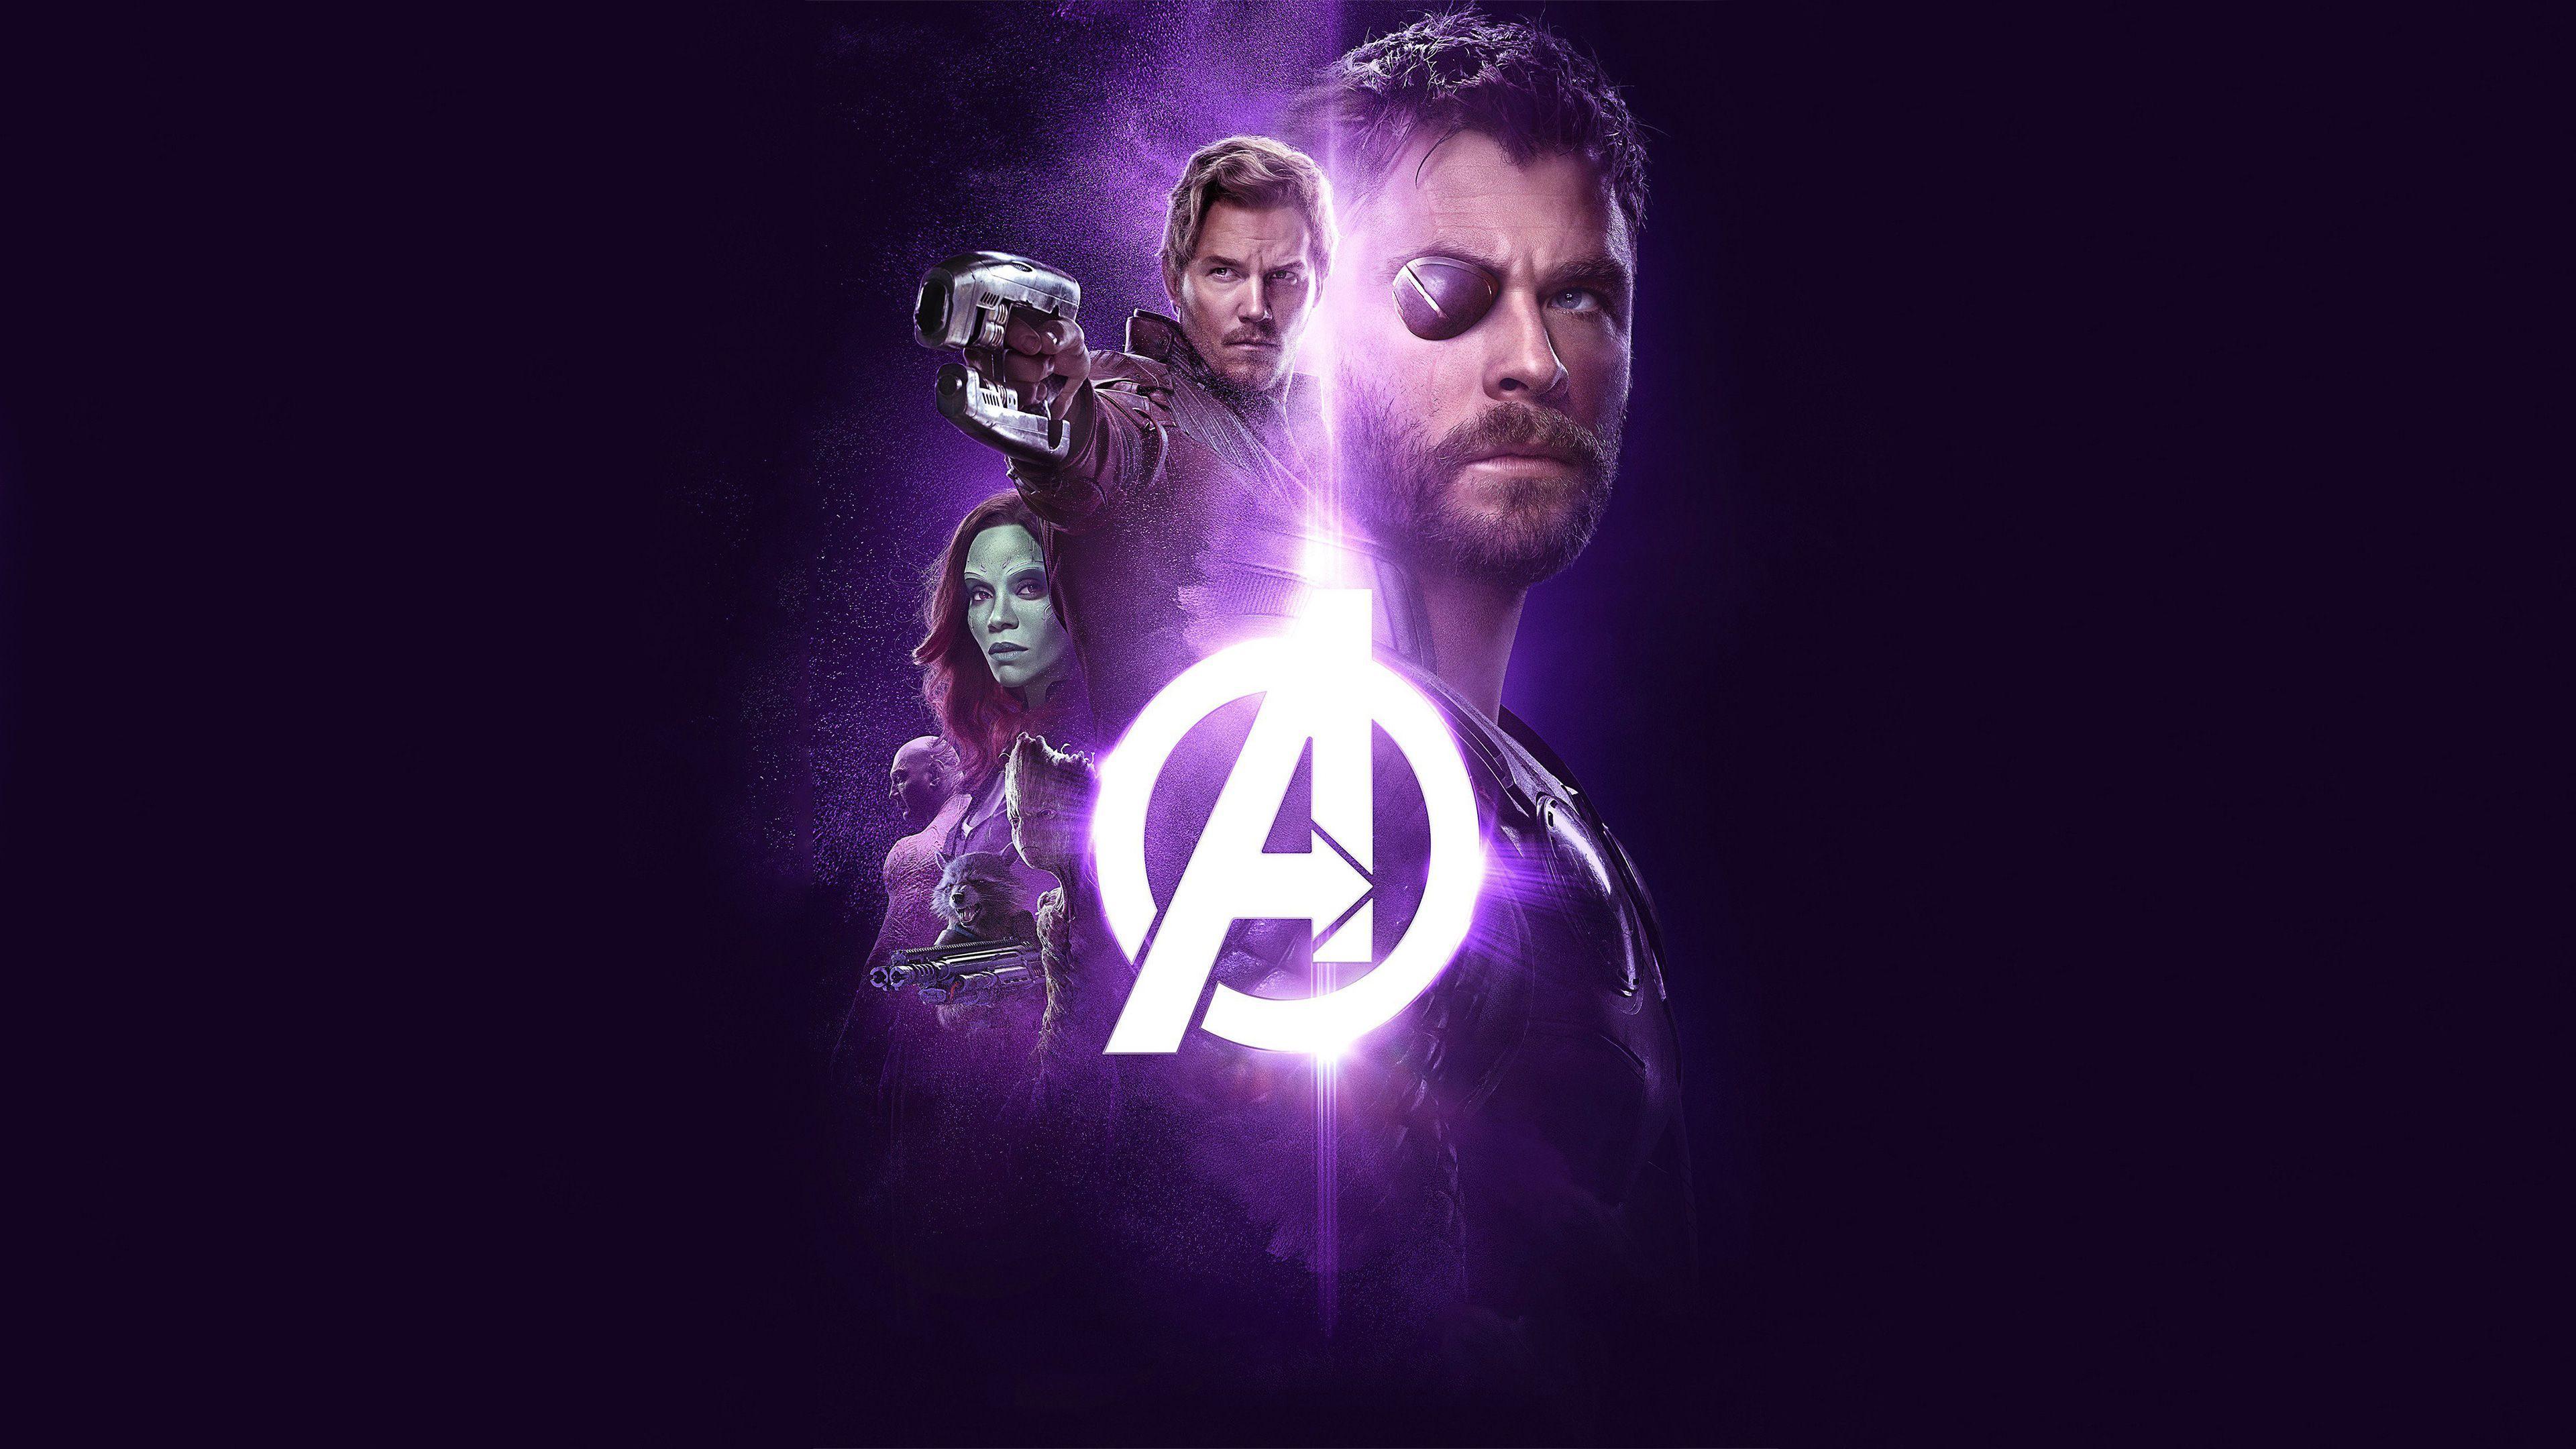 Thor Infinity War Wallpapers Top Free Thor Infinity War